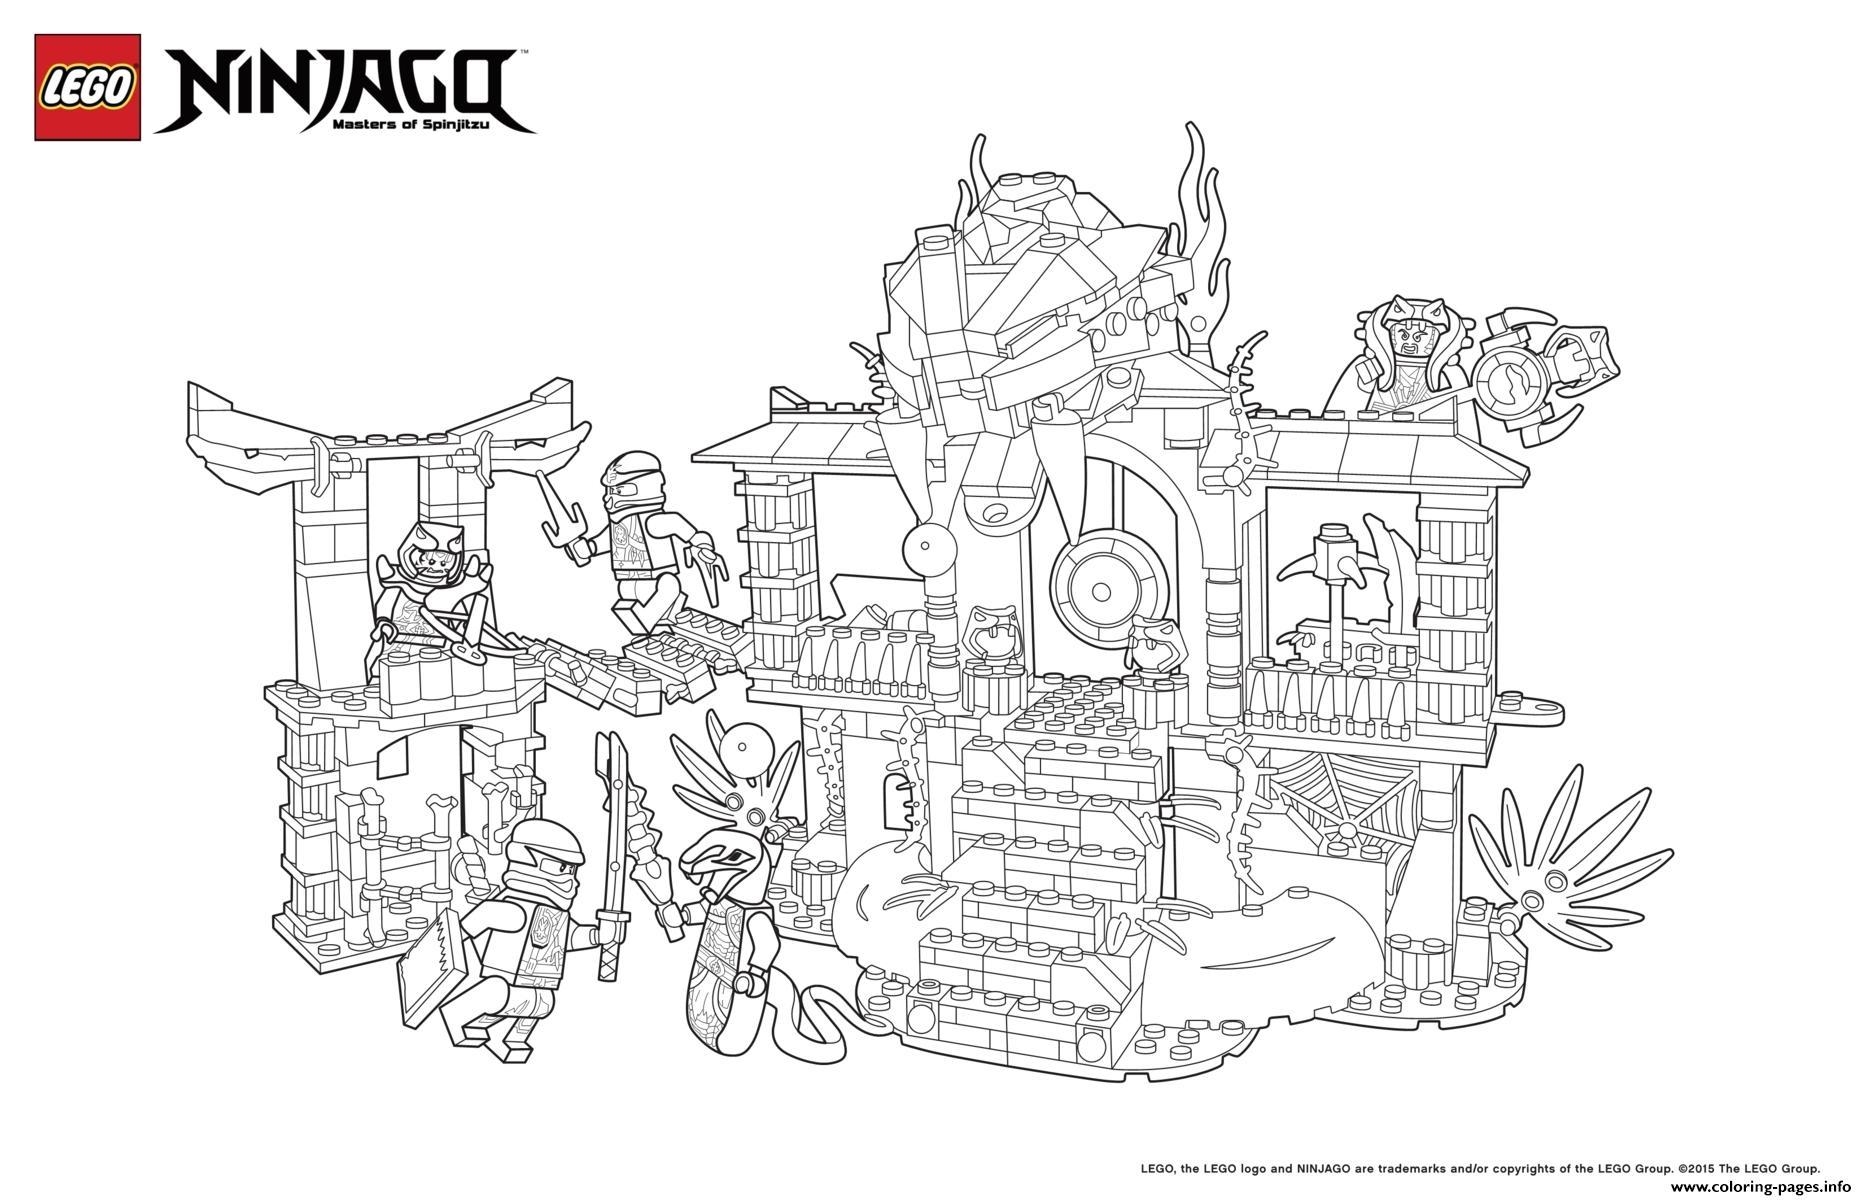 Ninjago Lego Palace Coloring Pages Printable